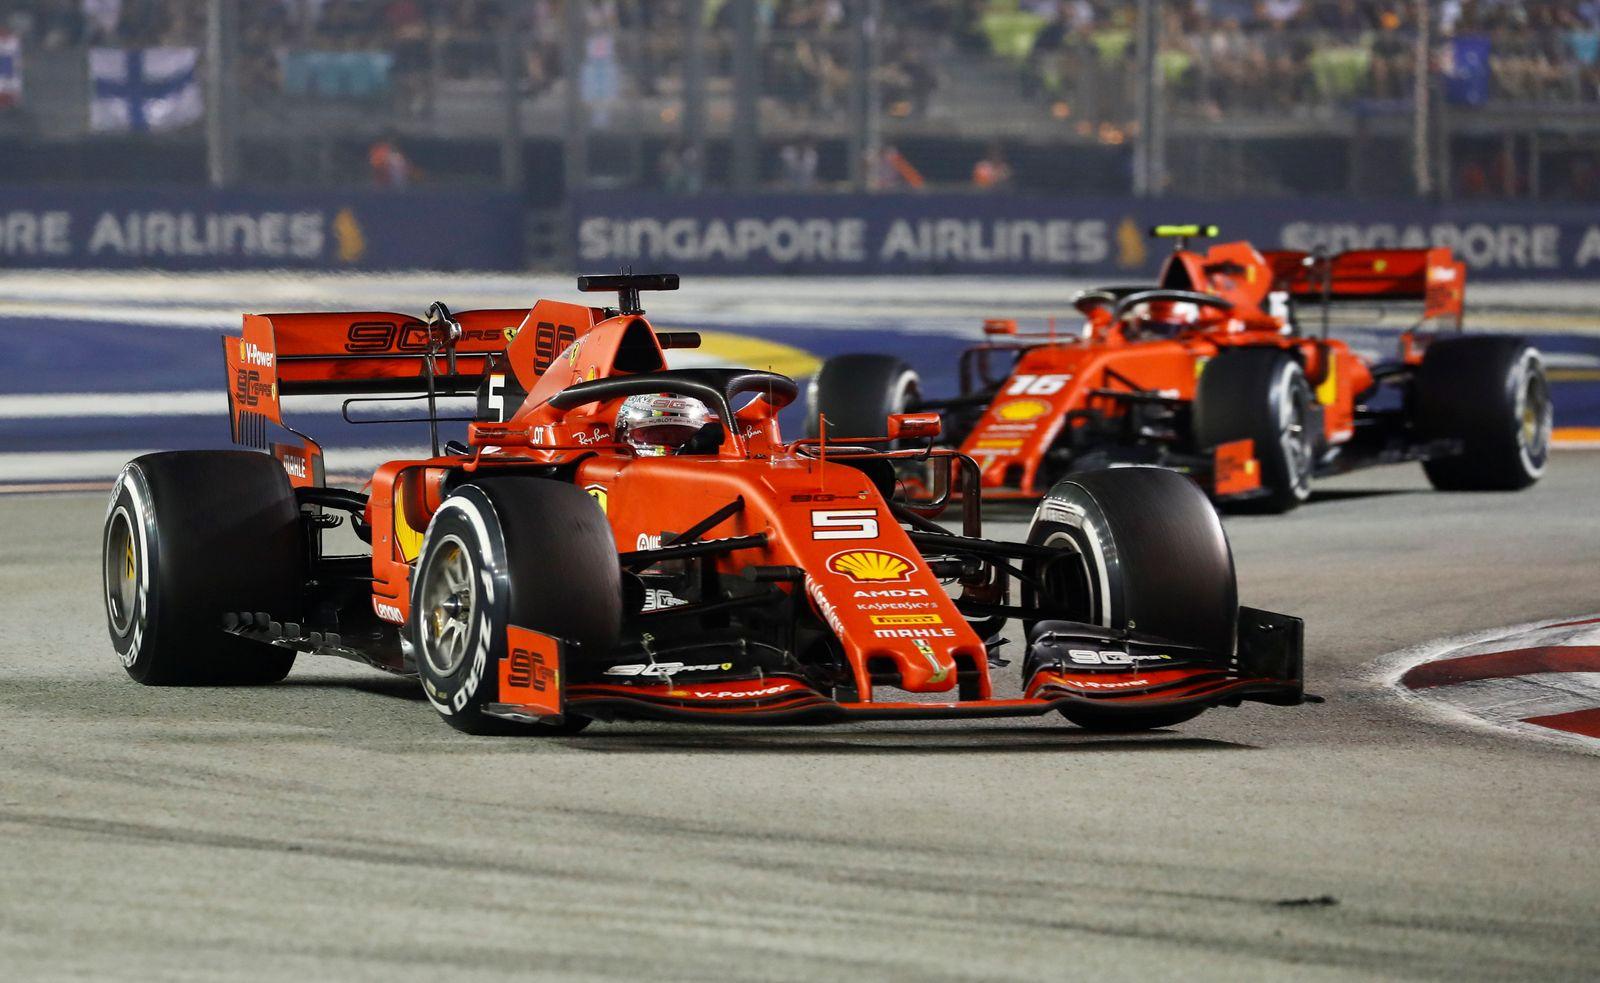 MOTOR-F1-SINGAPORE/